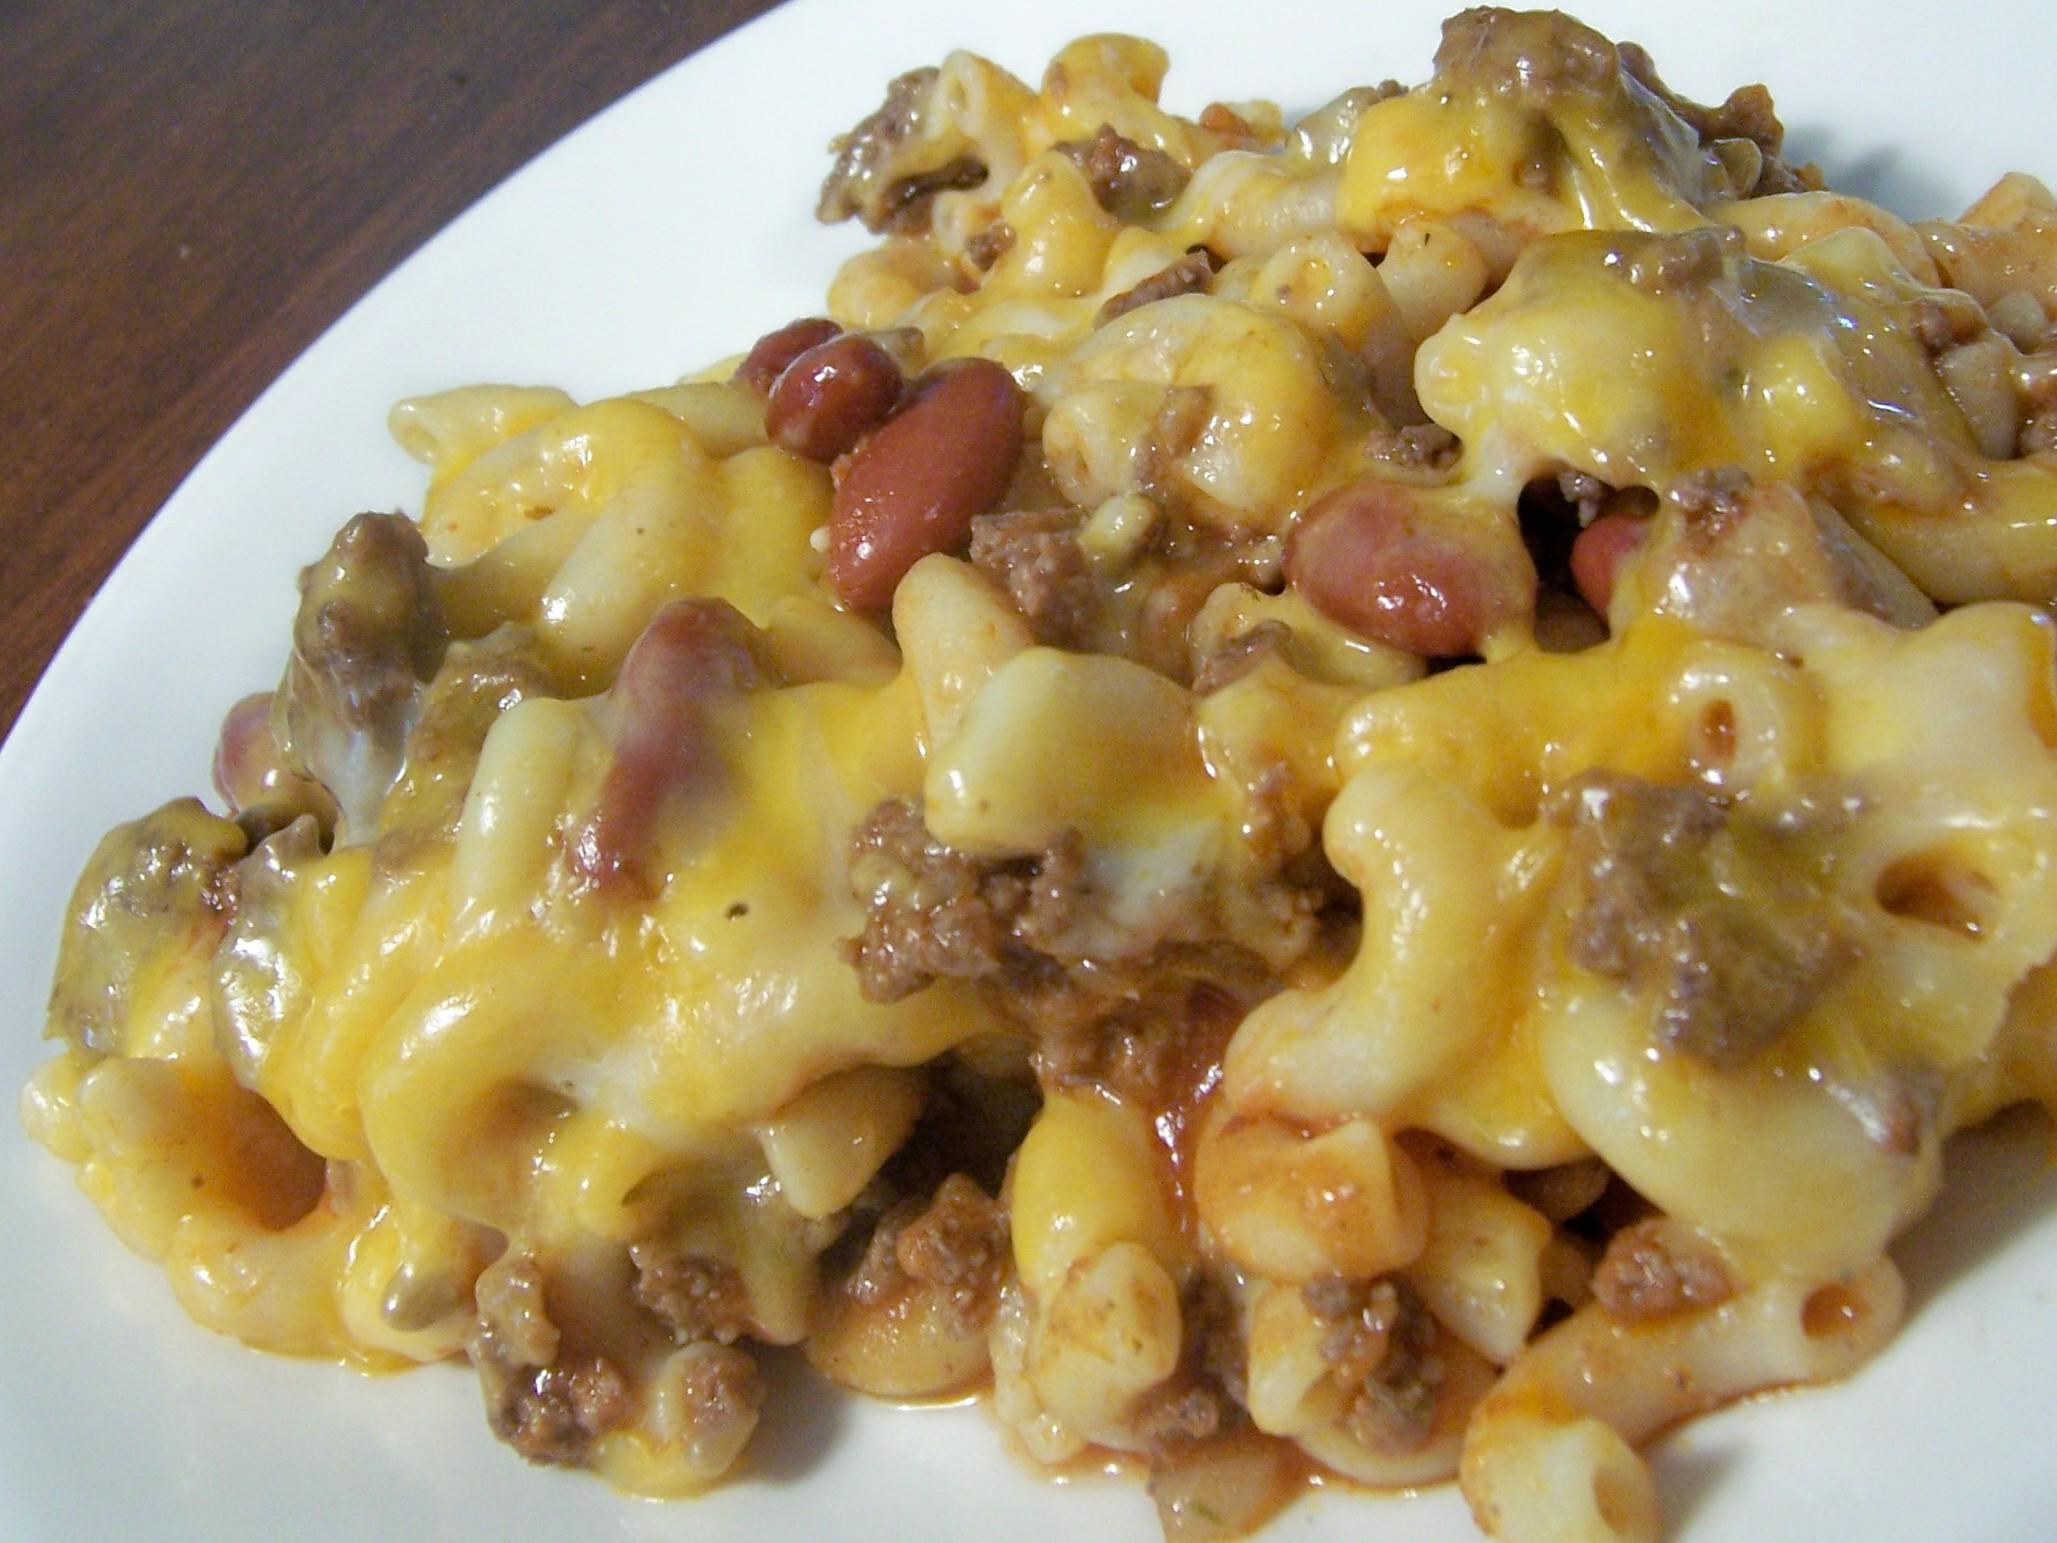 Easy Skillet Cheese-Topped Chili Macaroni